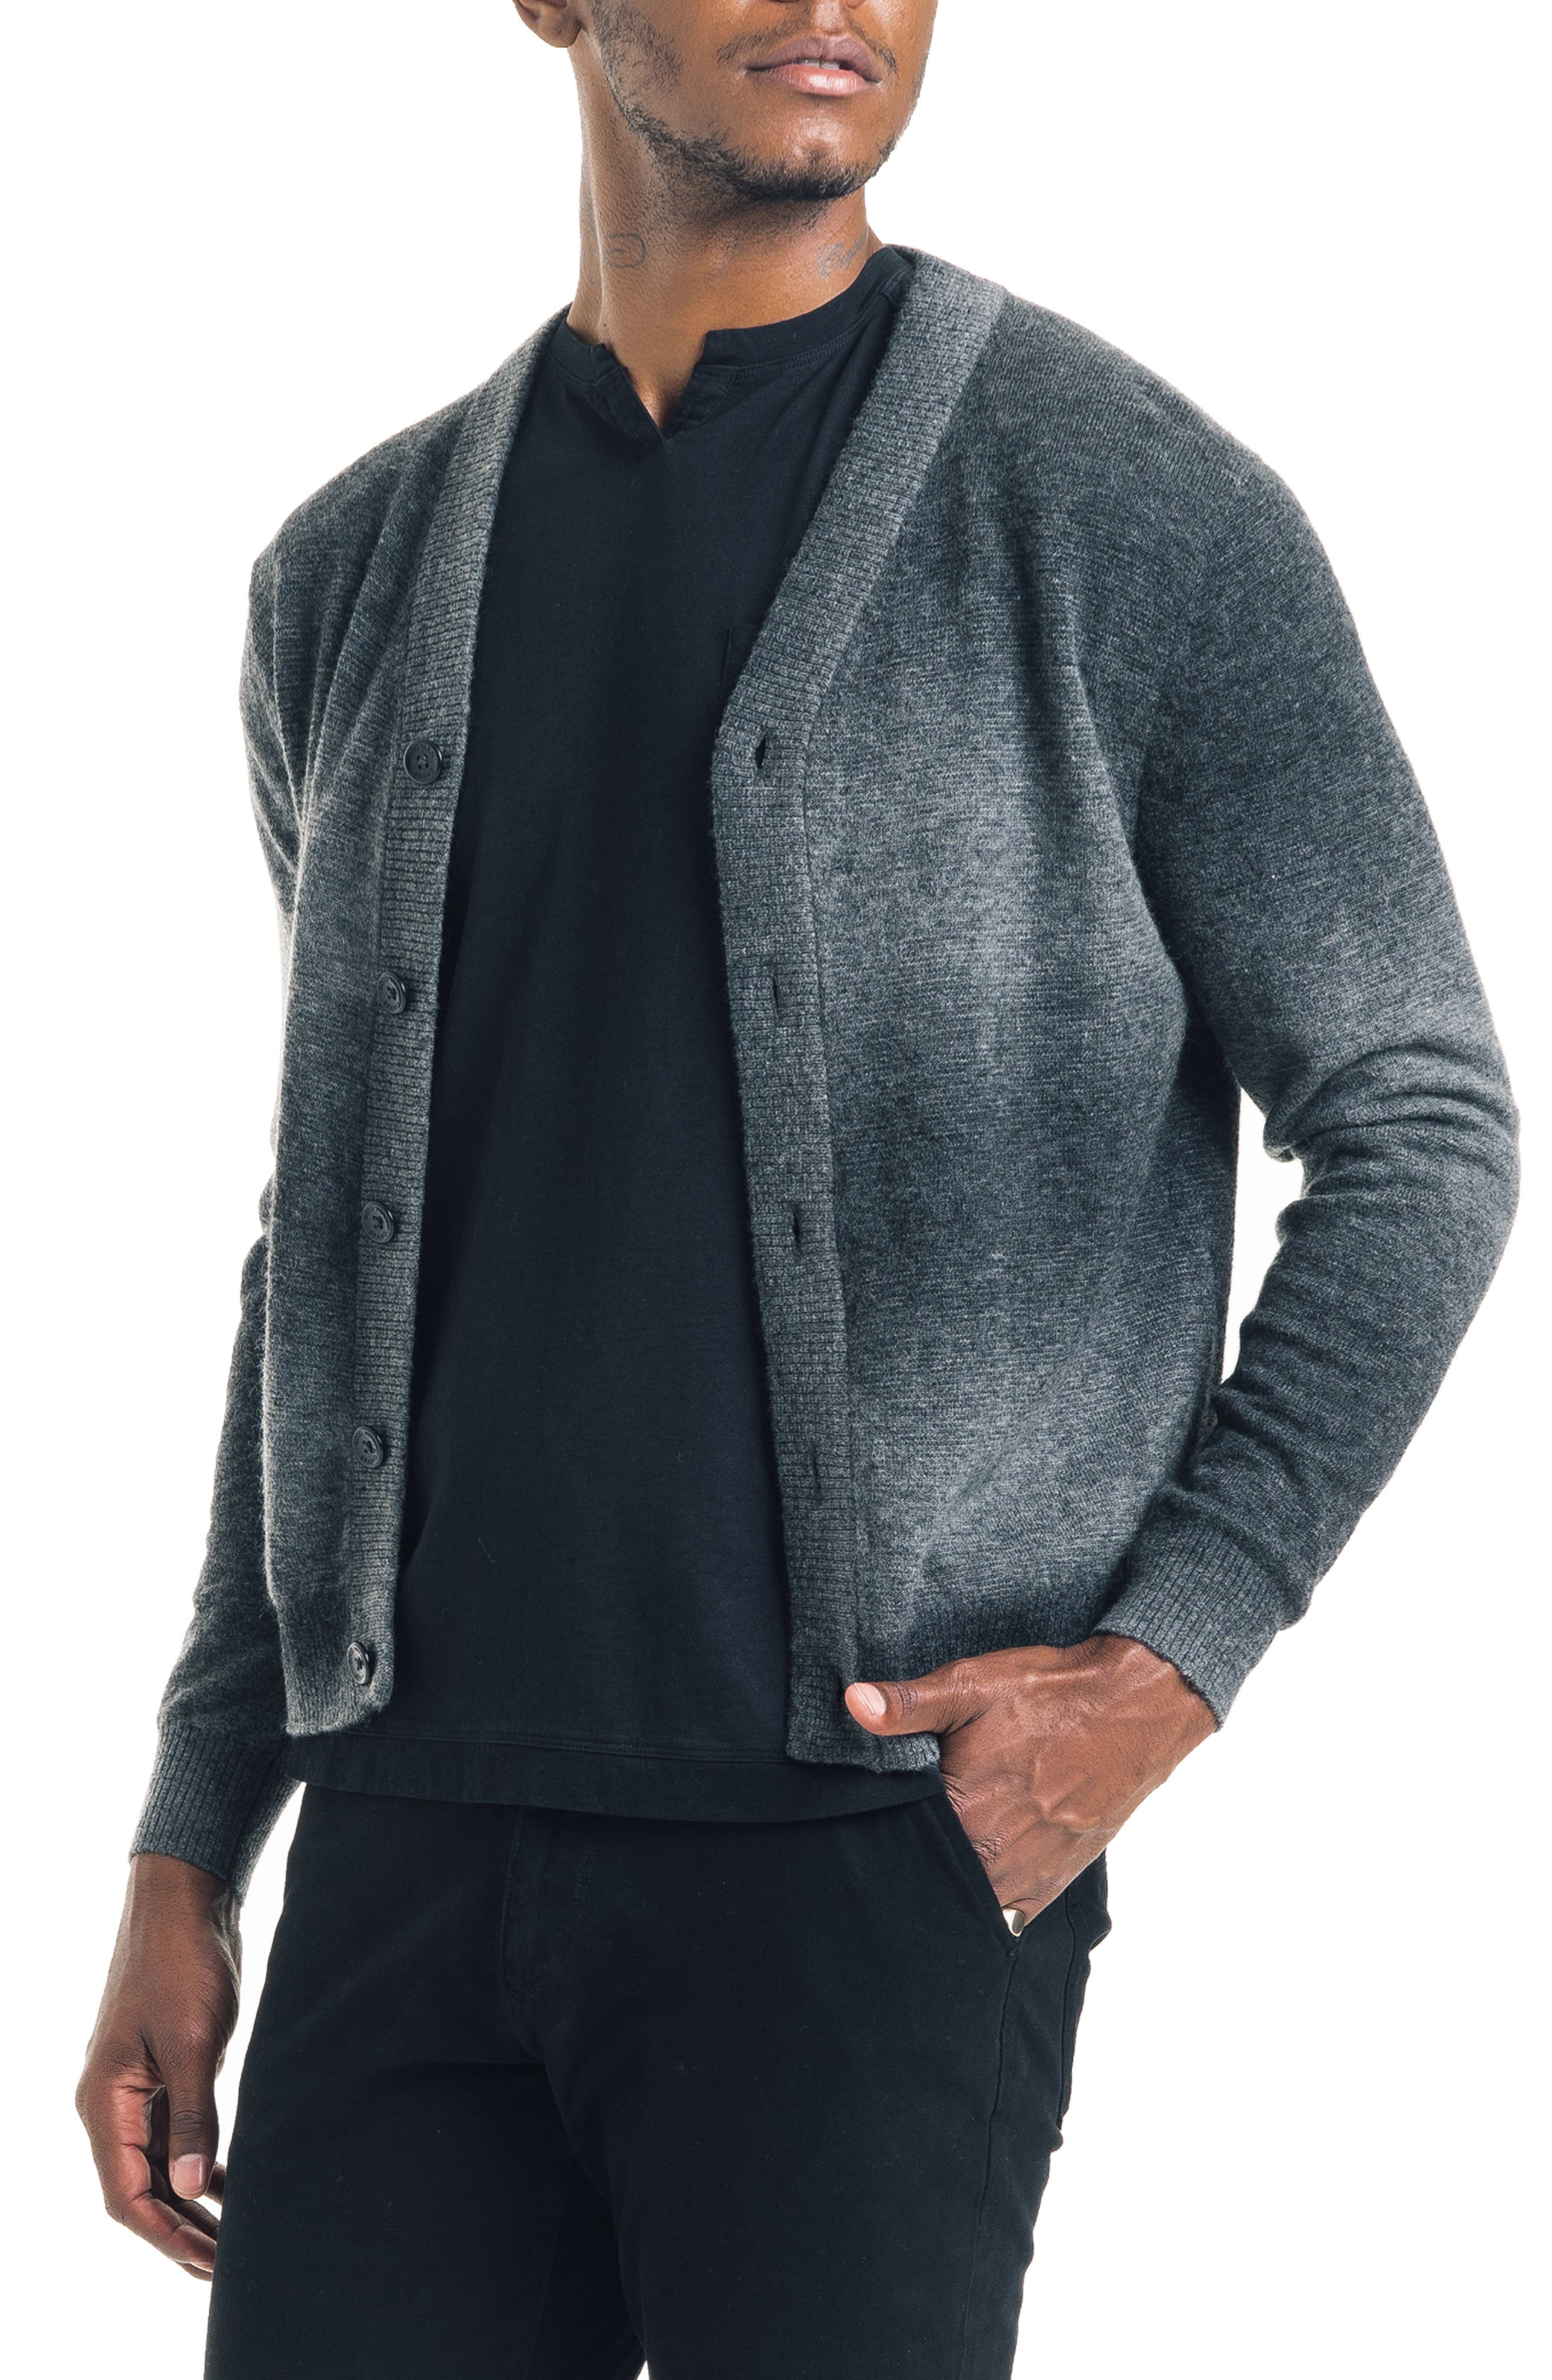 Good Man Brand Modern Slim Fit Merino Wool Blend Cardigan, Grey